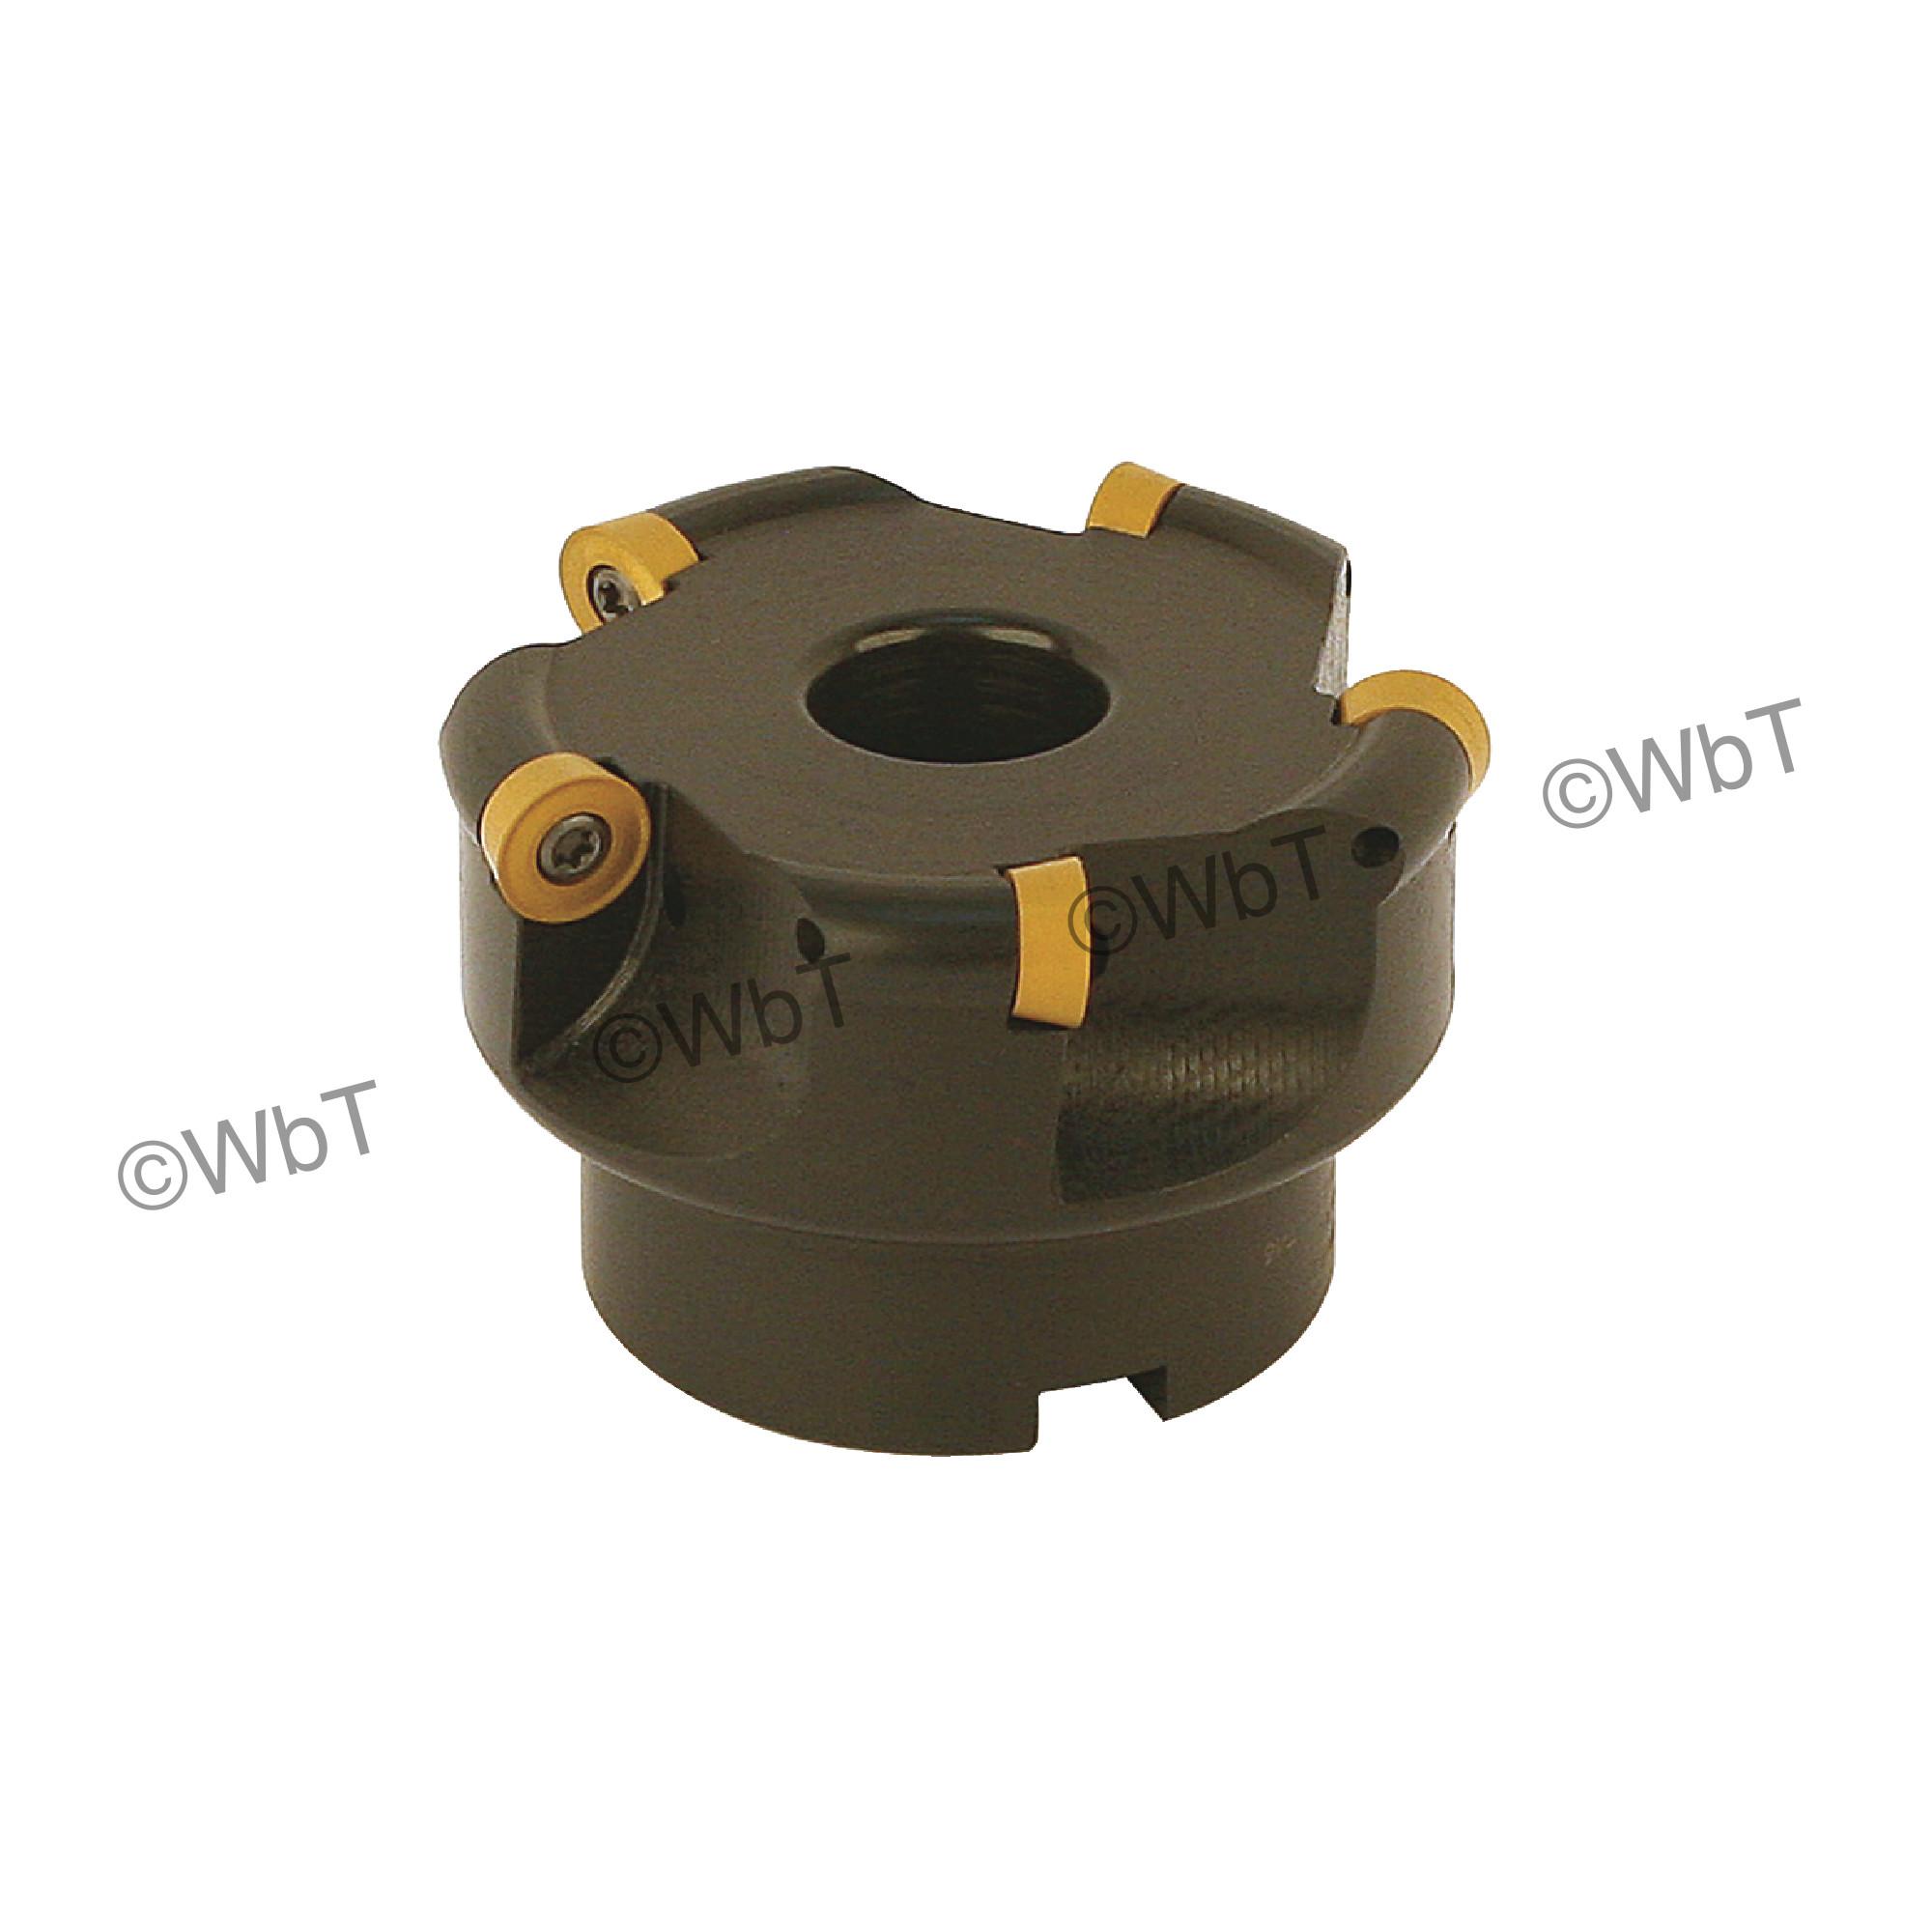 "AKUMA - 3.000"" Face Mill Set / Includes: (1) RPC.43.300R-5 (3.0""ø) & (10) RPMT1204M0S-M1 CM30P Coated Inserts / R"